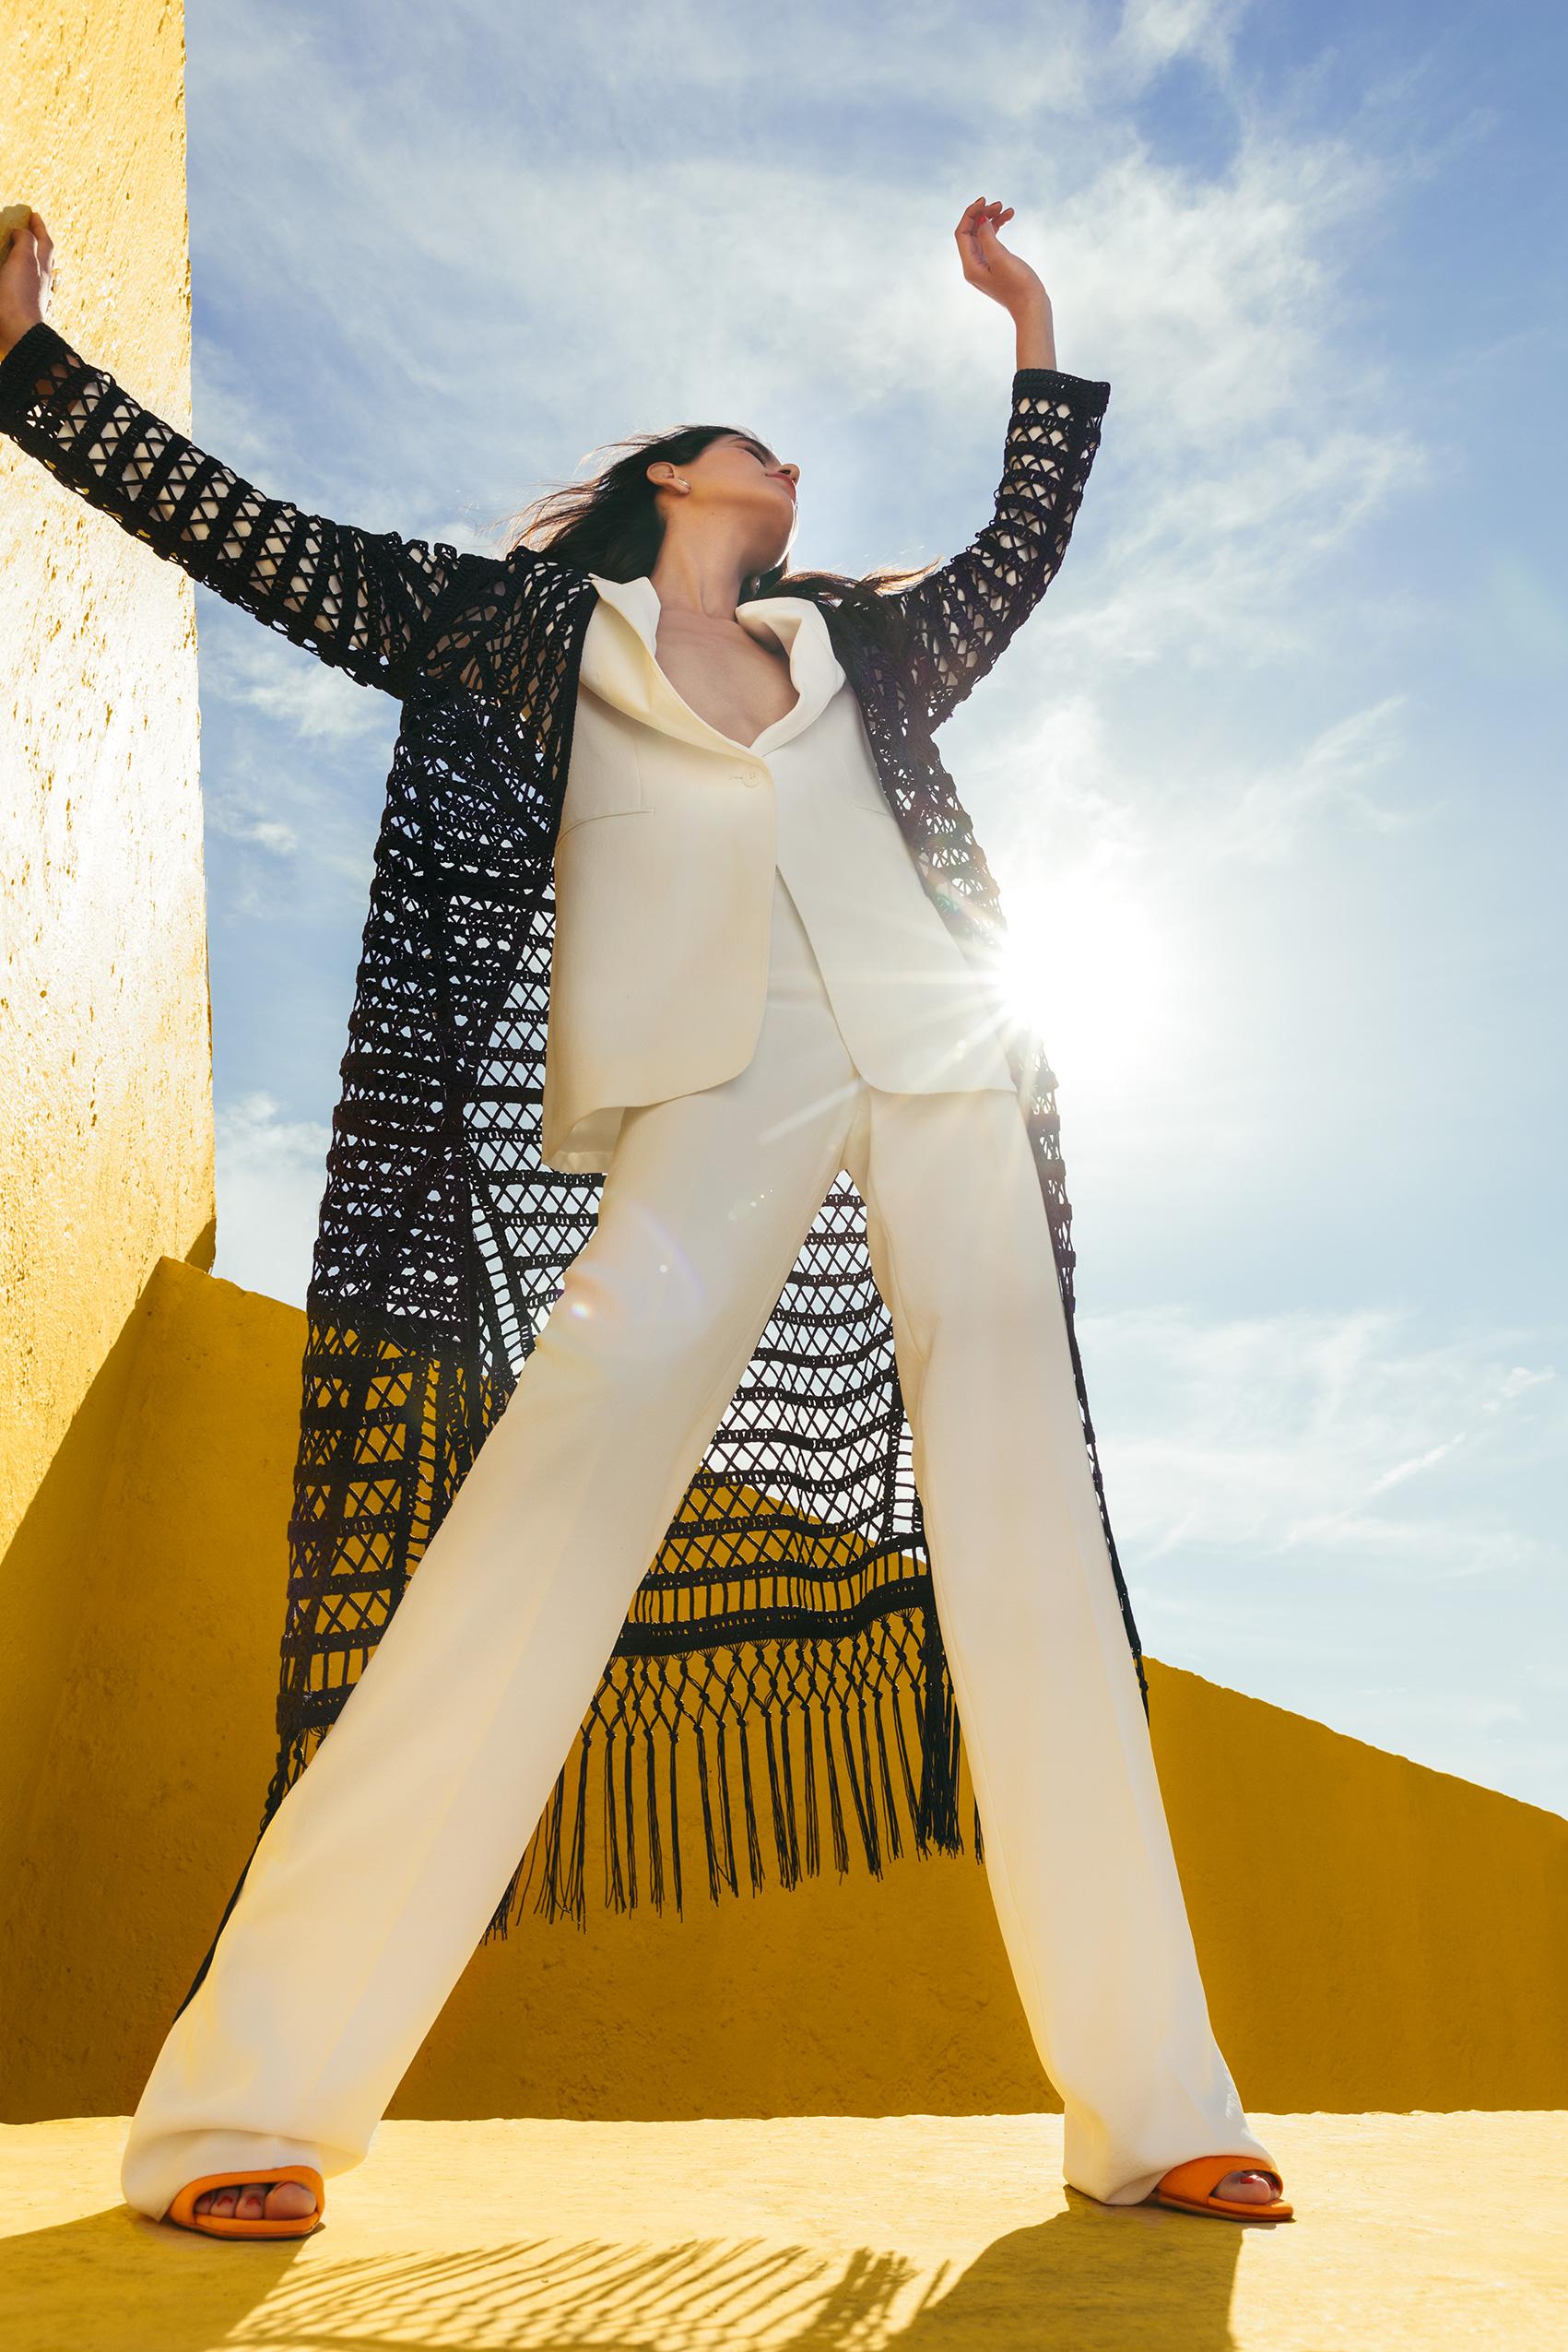 El Libro Amarillo - sobretodo Chester & Peck _ saco y pantalón Adolfo Domínguez _ zapatos Hermès _ aretes Tane